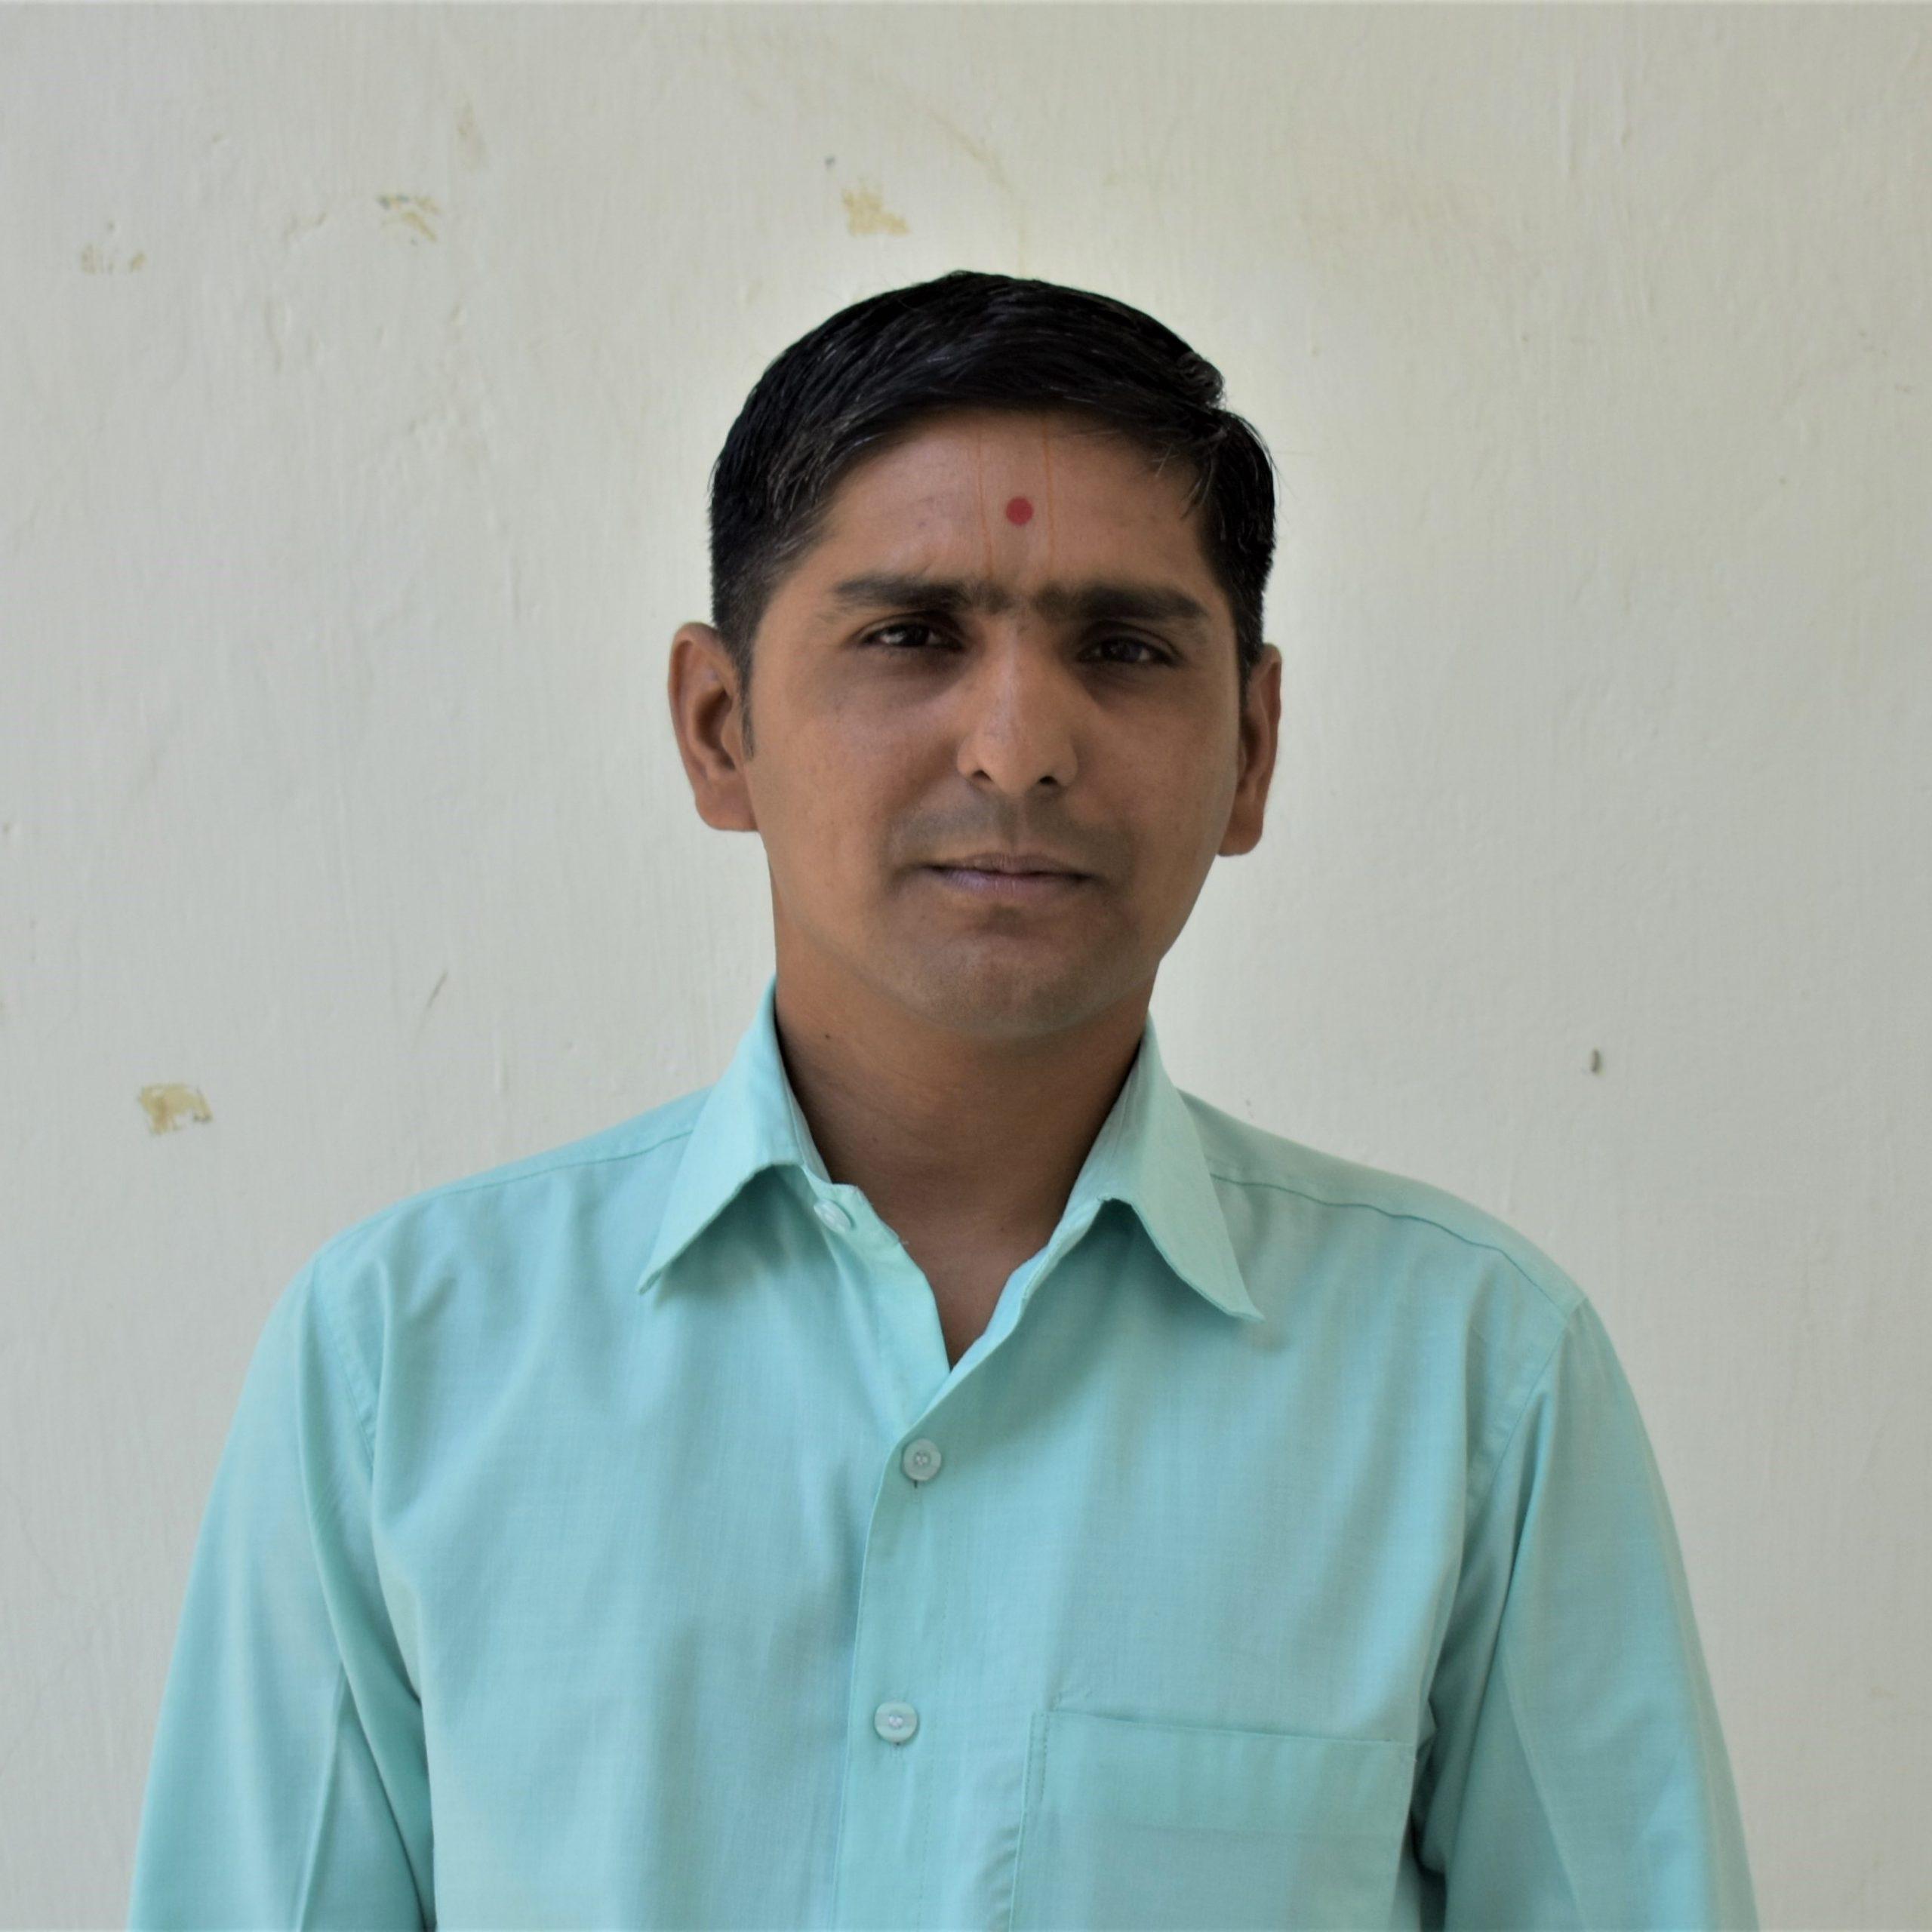 Mr. Vipul B. Prajapati